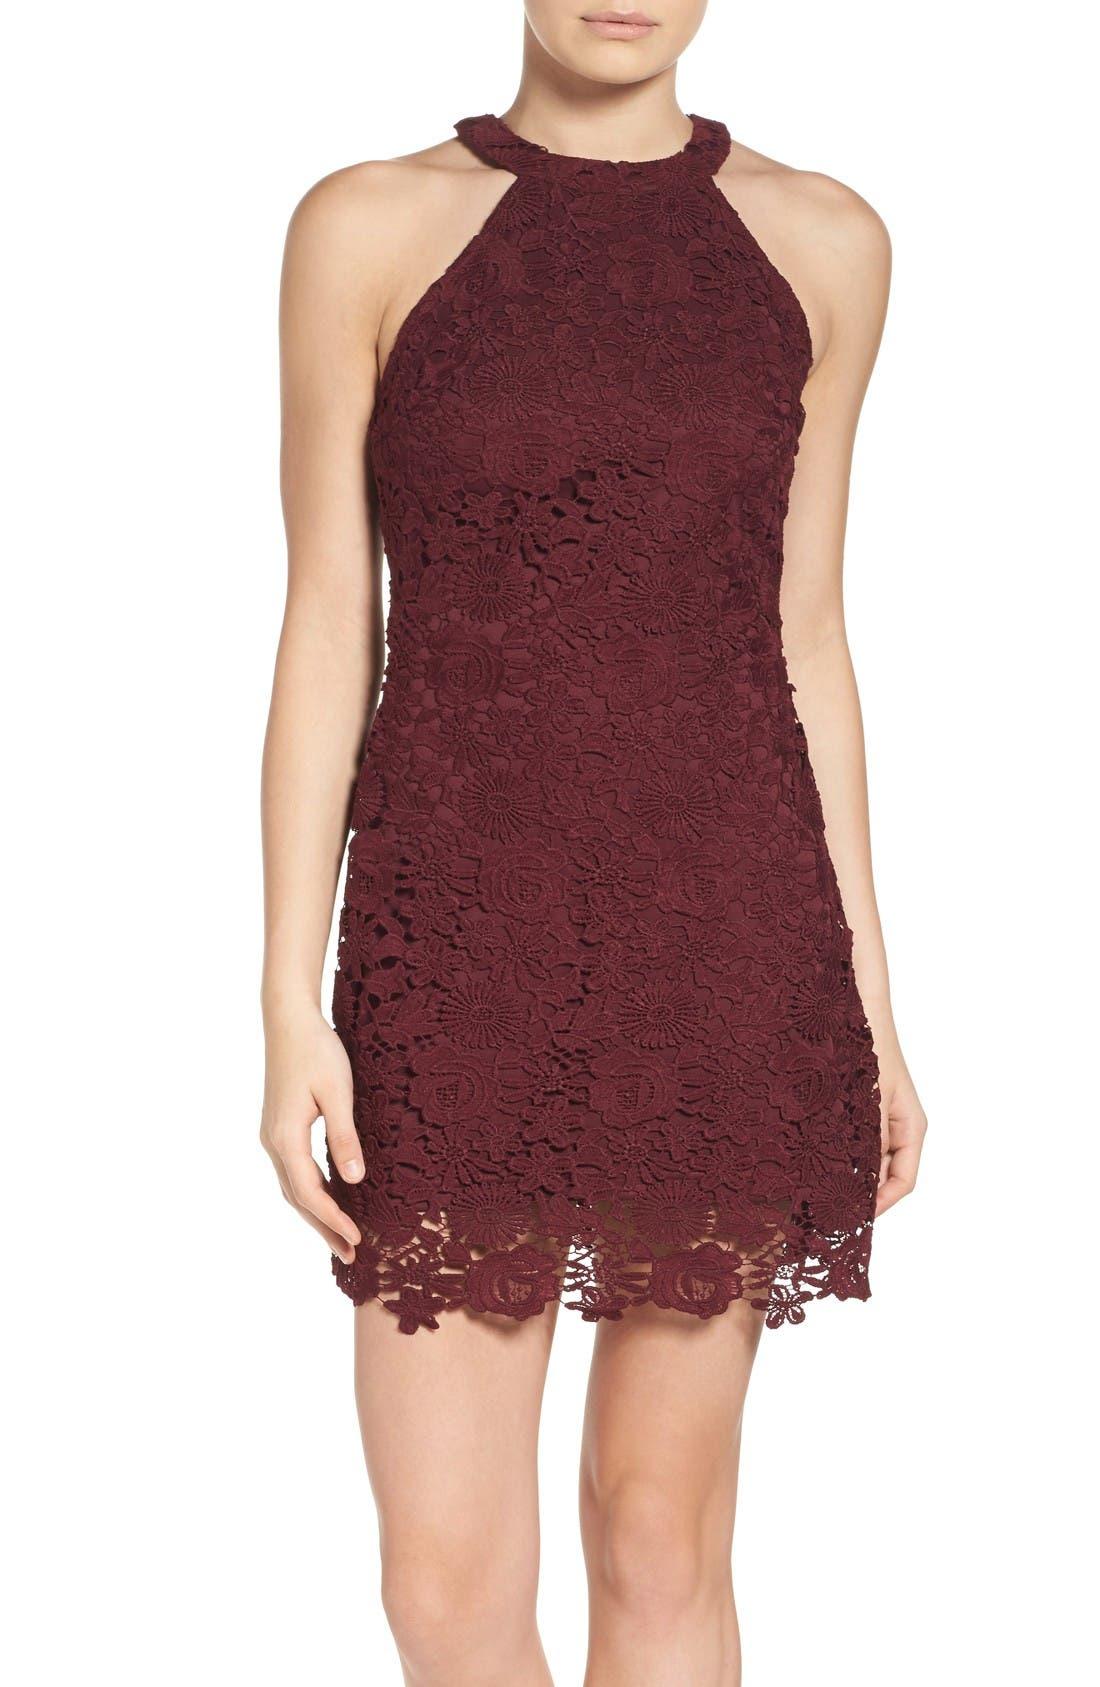 Alternate Image 1 Selected - Lulus Lace Halter Dress